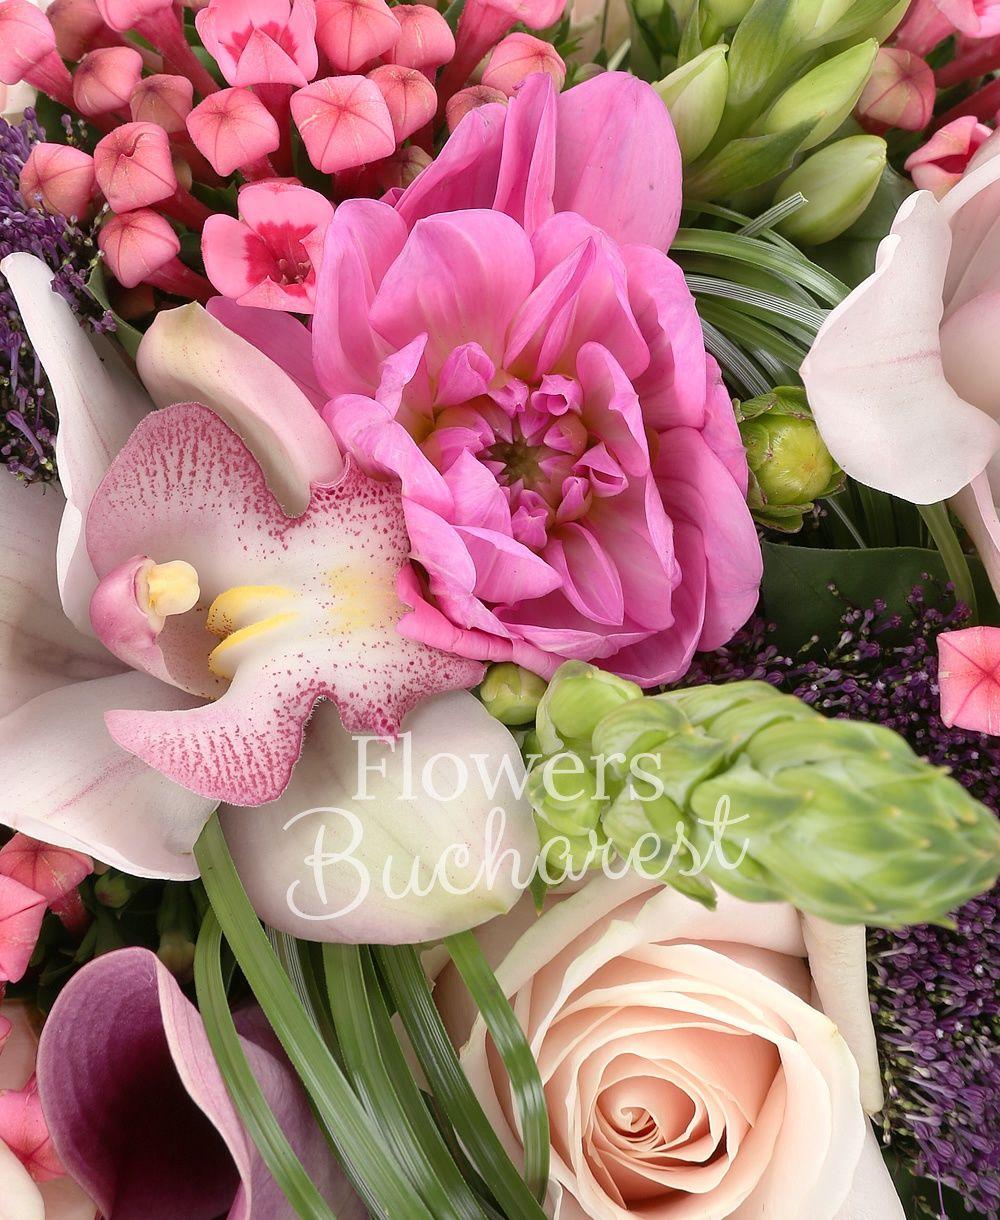 9 white ornithogalum, 7 pink dahlias 7 pink roses, 7 pink bouvardia, 7 pink cala, 7 mauve trachelium, white cymbidium, greenery